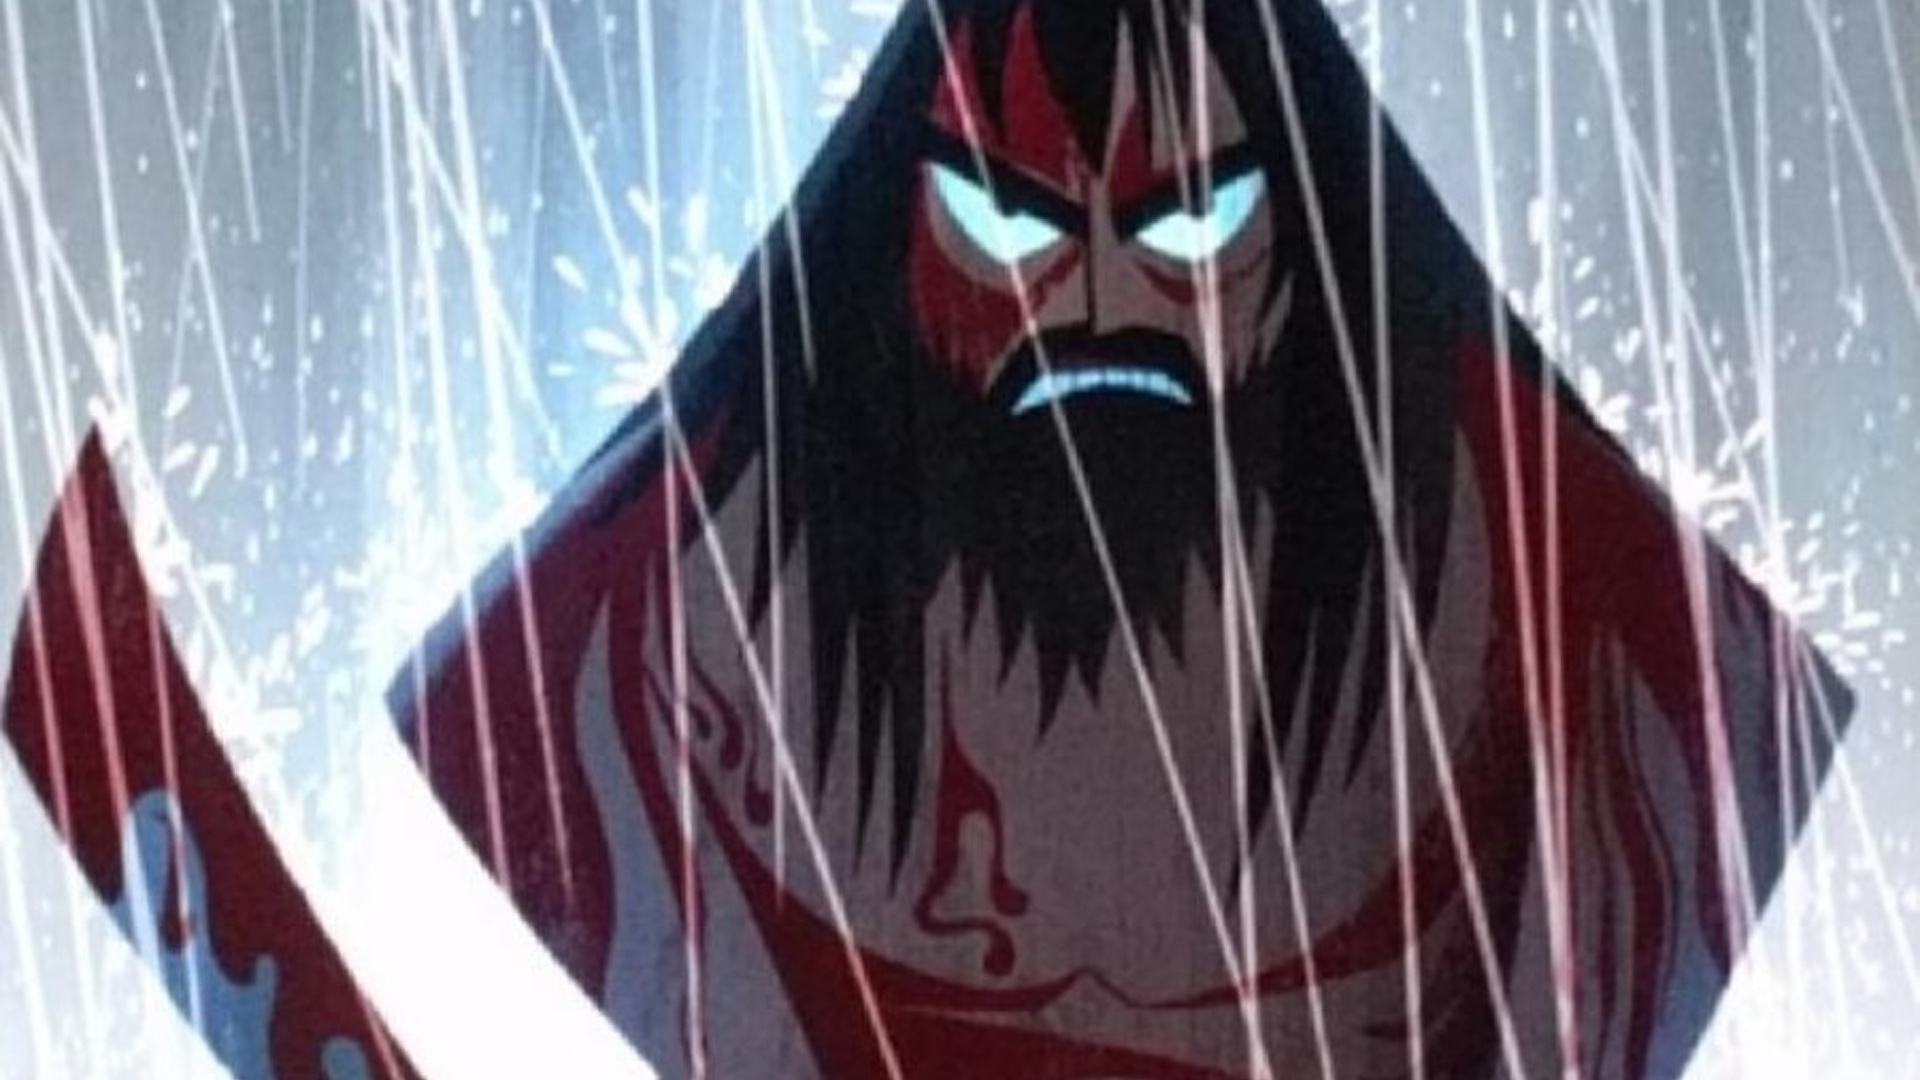 Adult Swim S Samurai Jack Gets A Cool Behind The Scenes Featurette